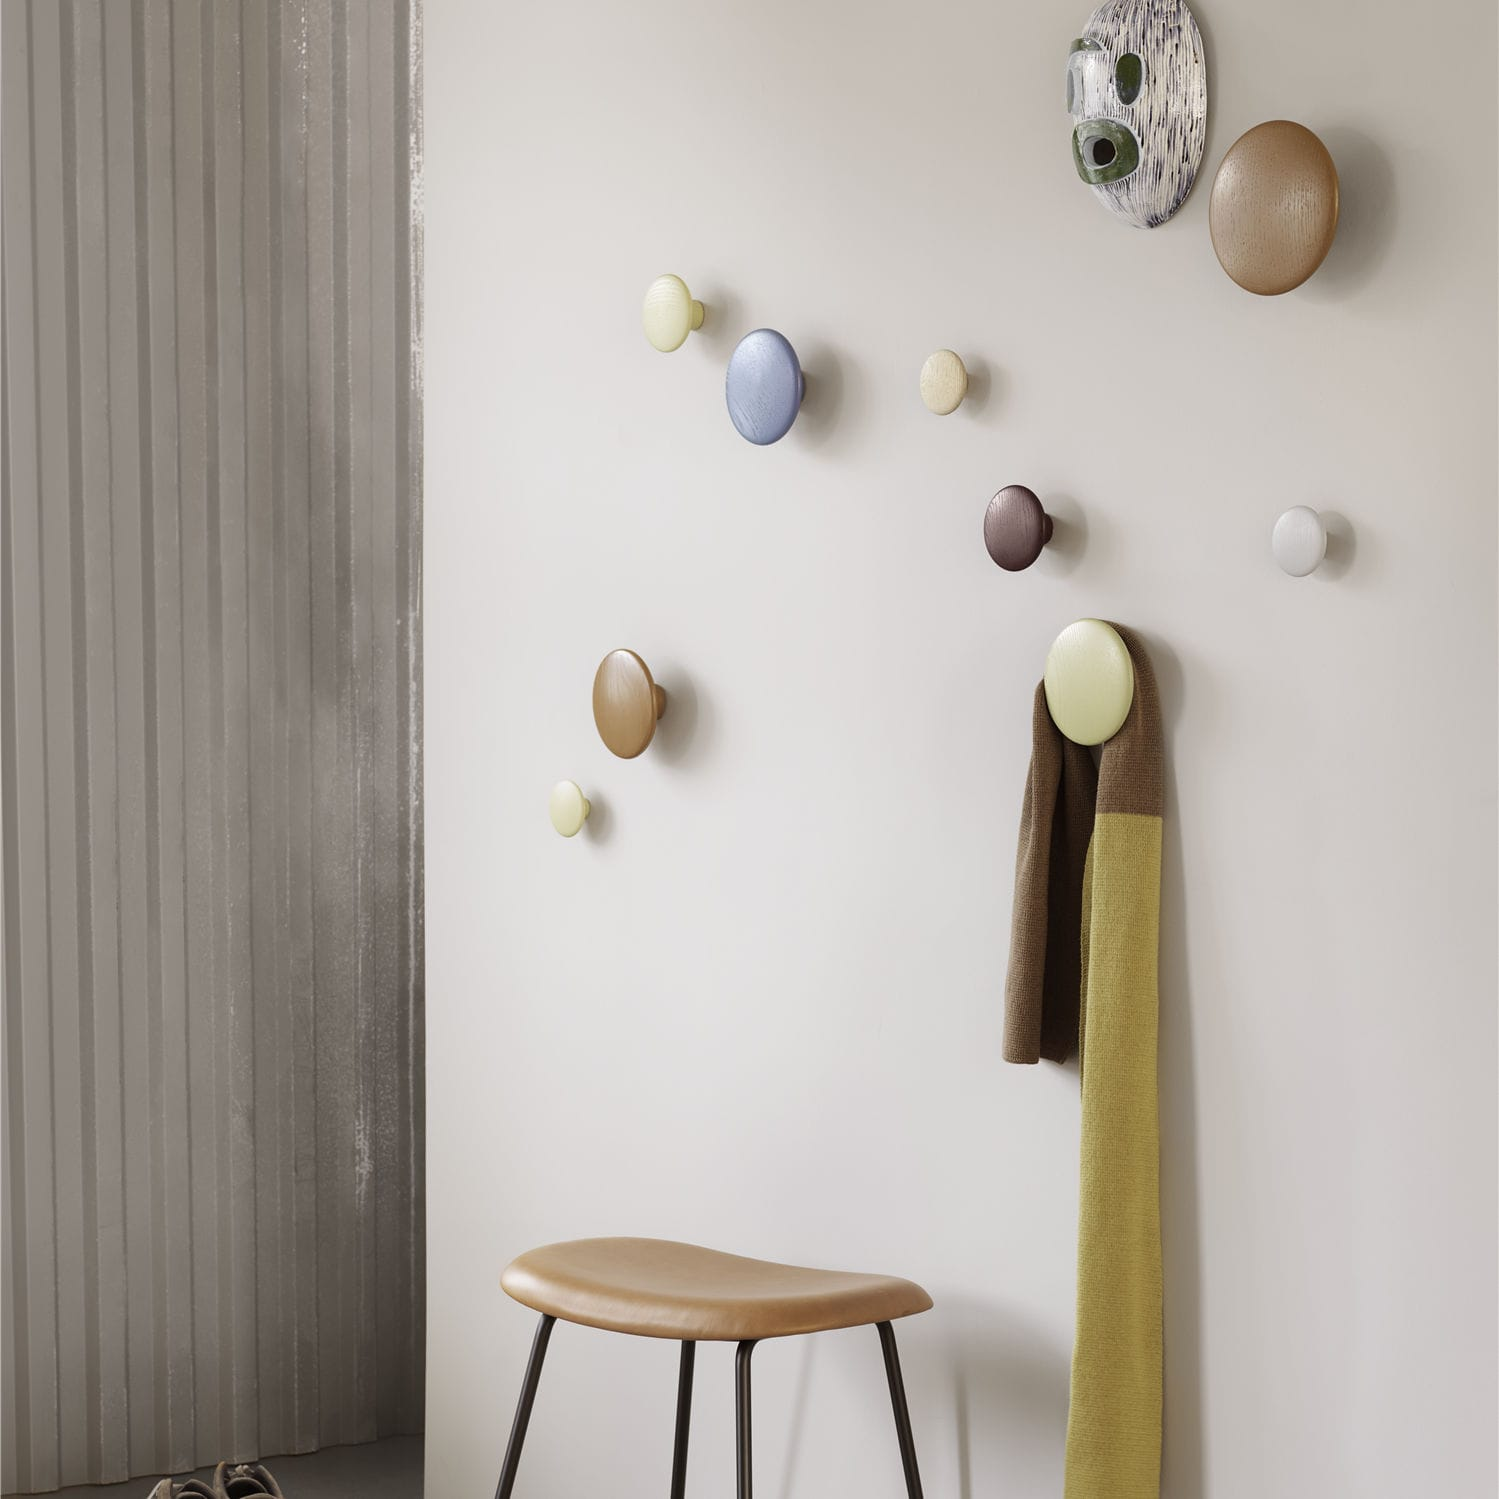 Best Appendiabiti A Muro Moderni Ideas - Home Design - joygree.info